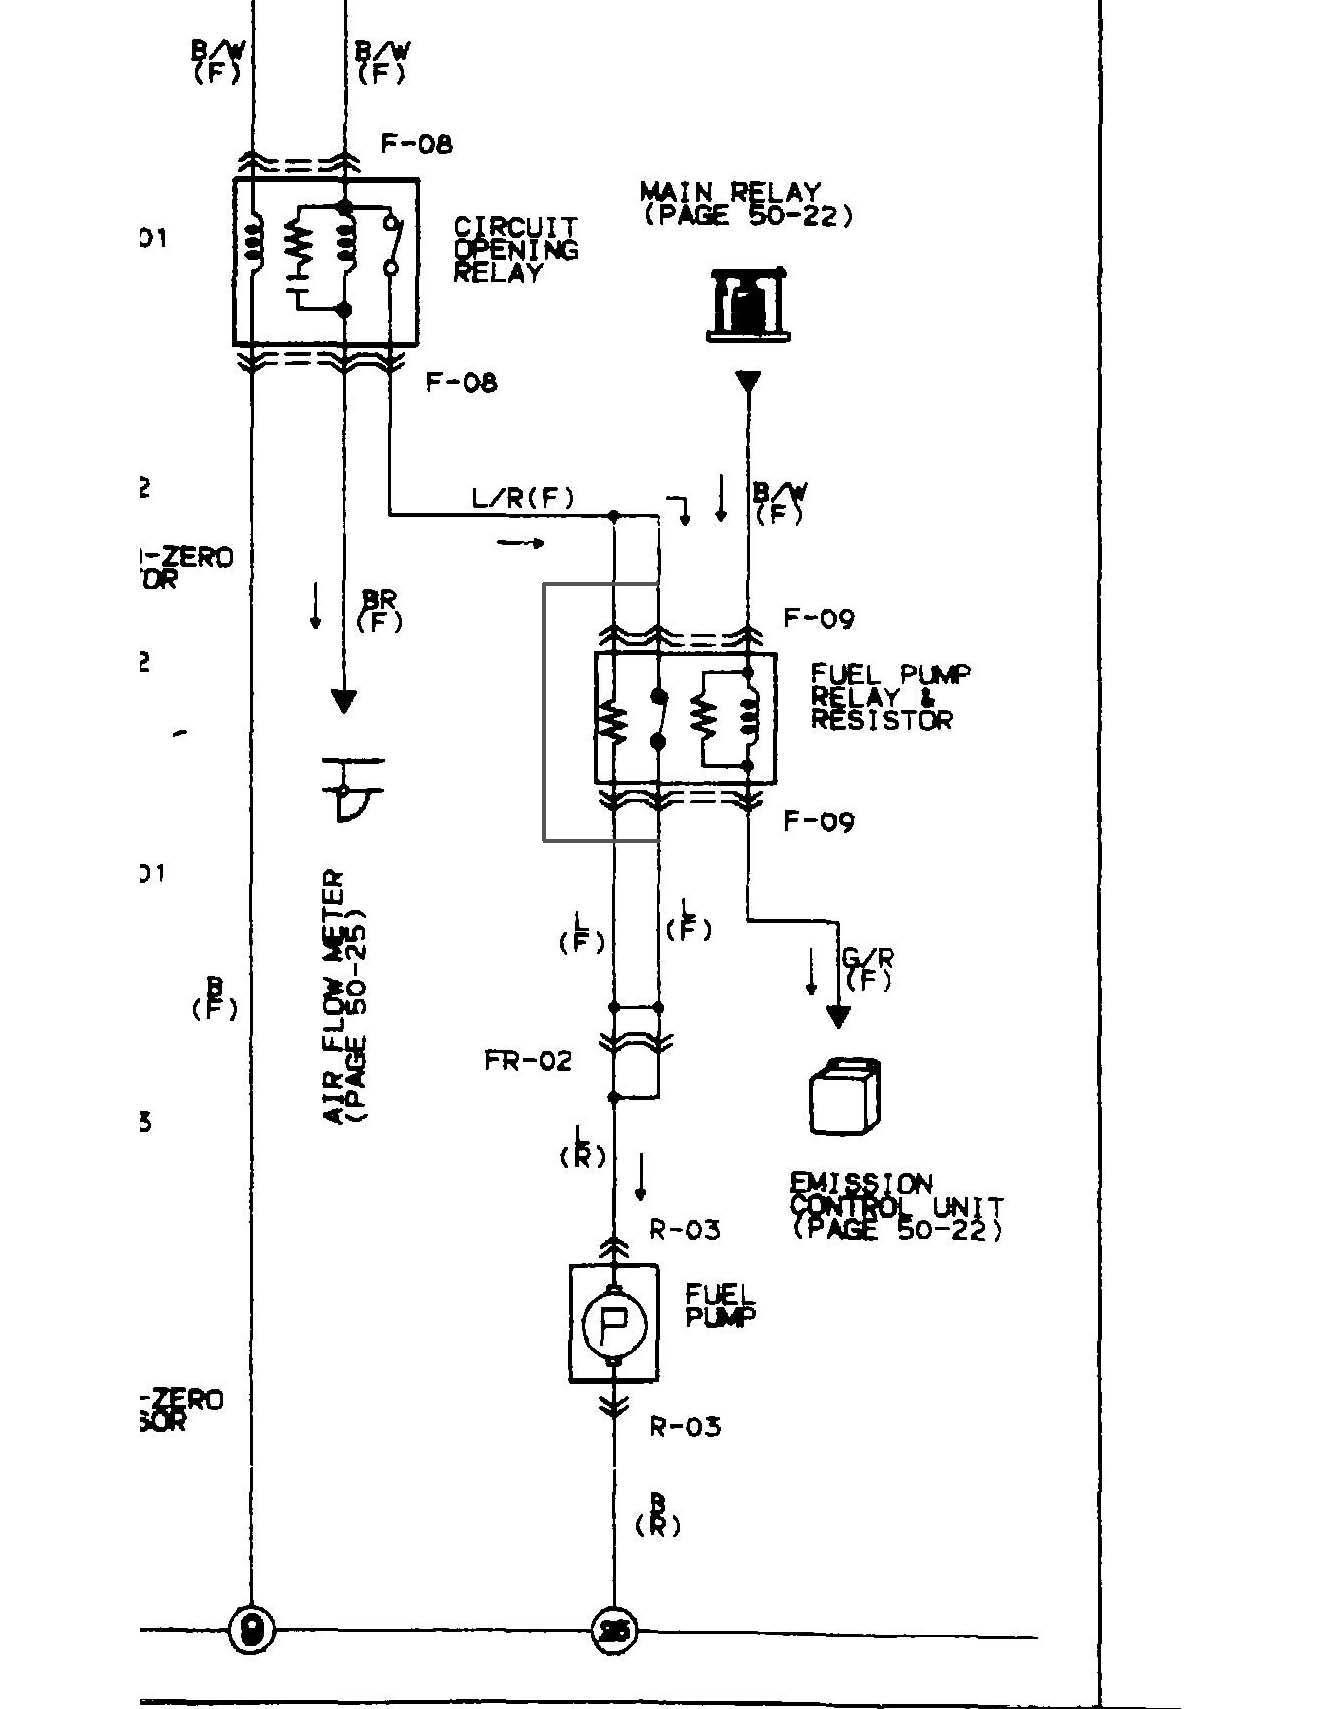 1992 mazda b2200 alternator wiring diagram typical house 1986 rx 7 auto